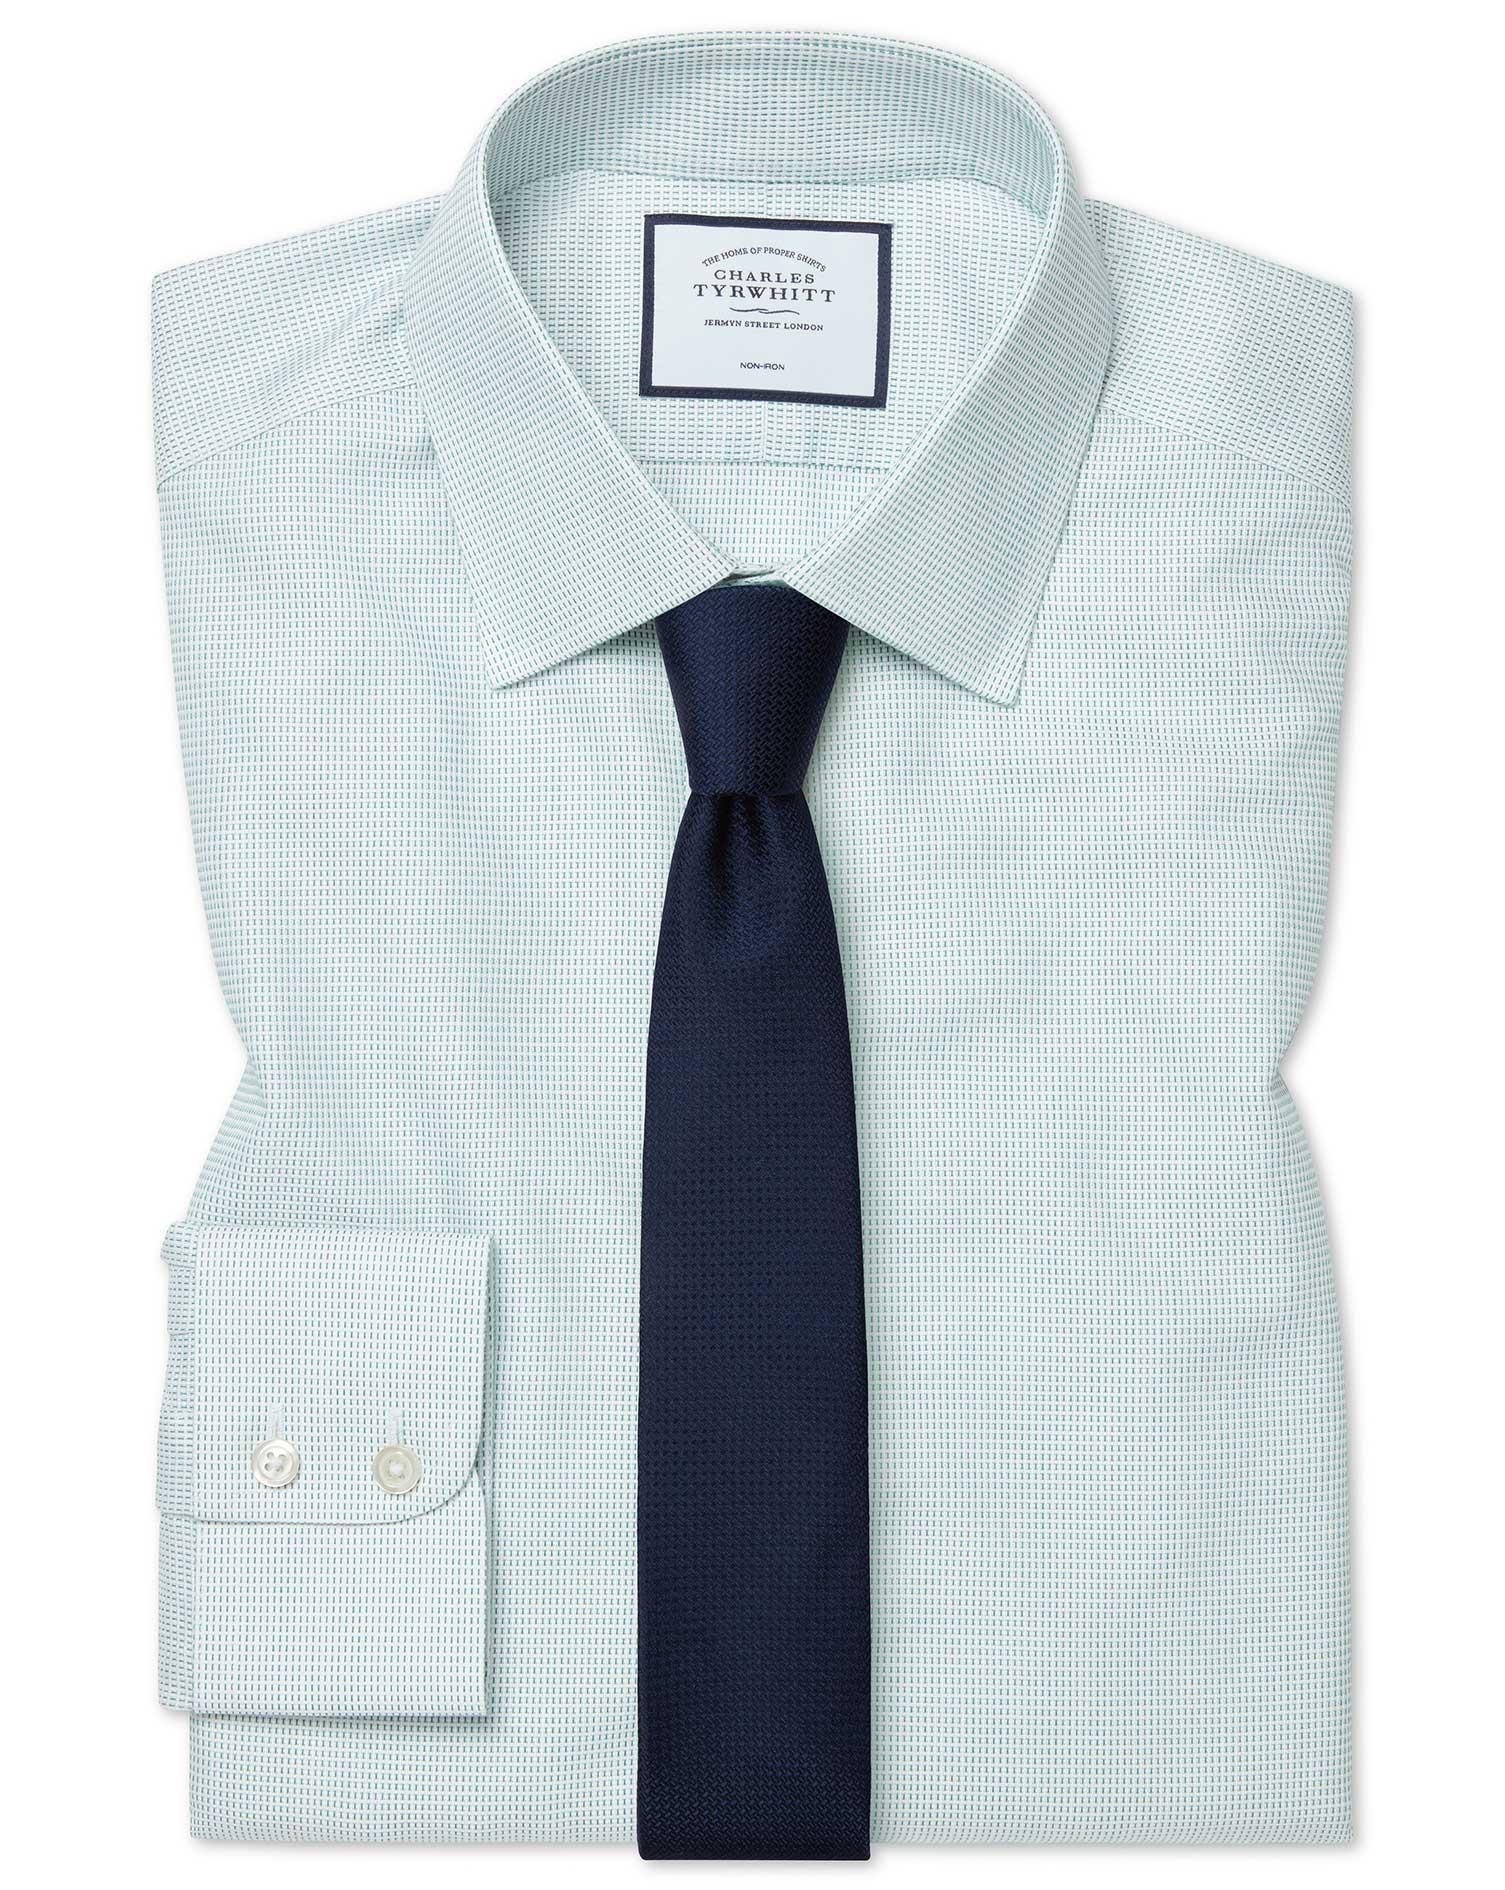 Cotton Extra Slim Fit Non-Iron Dash Weave Green Shirt